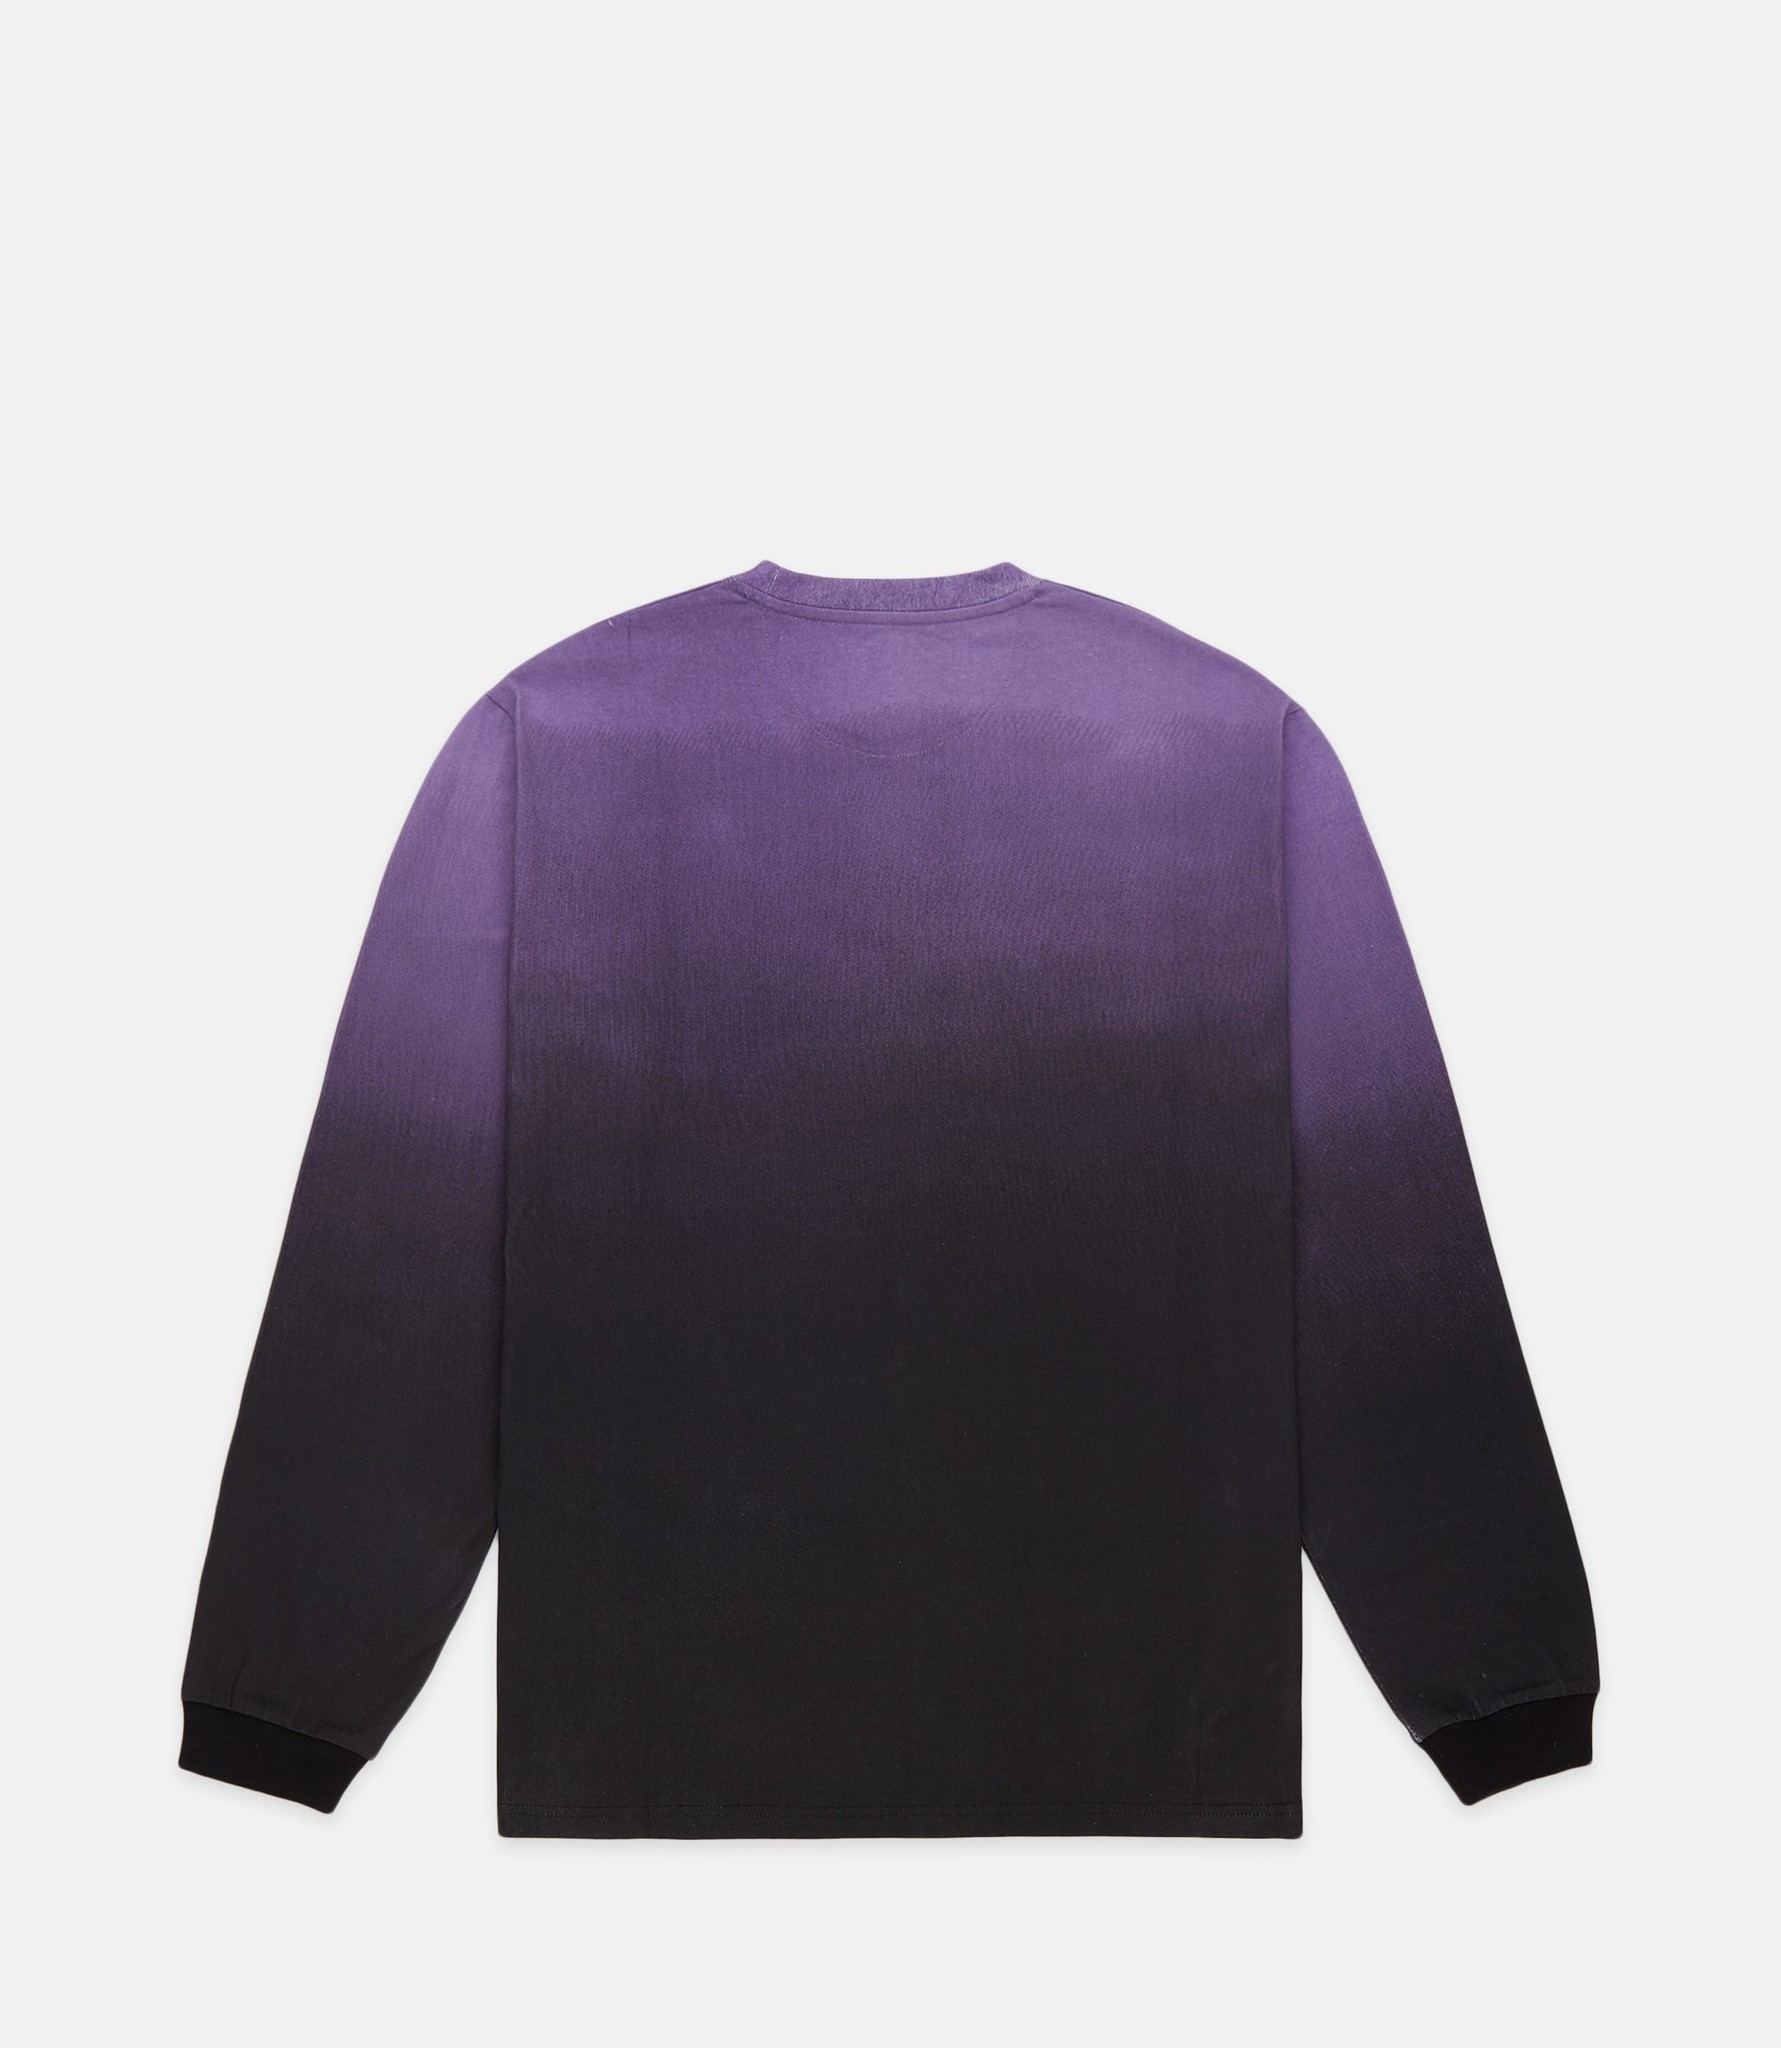 10 Deep 10 Deep Pale Horse LS purple